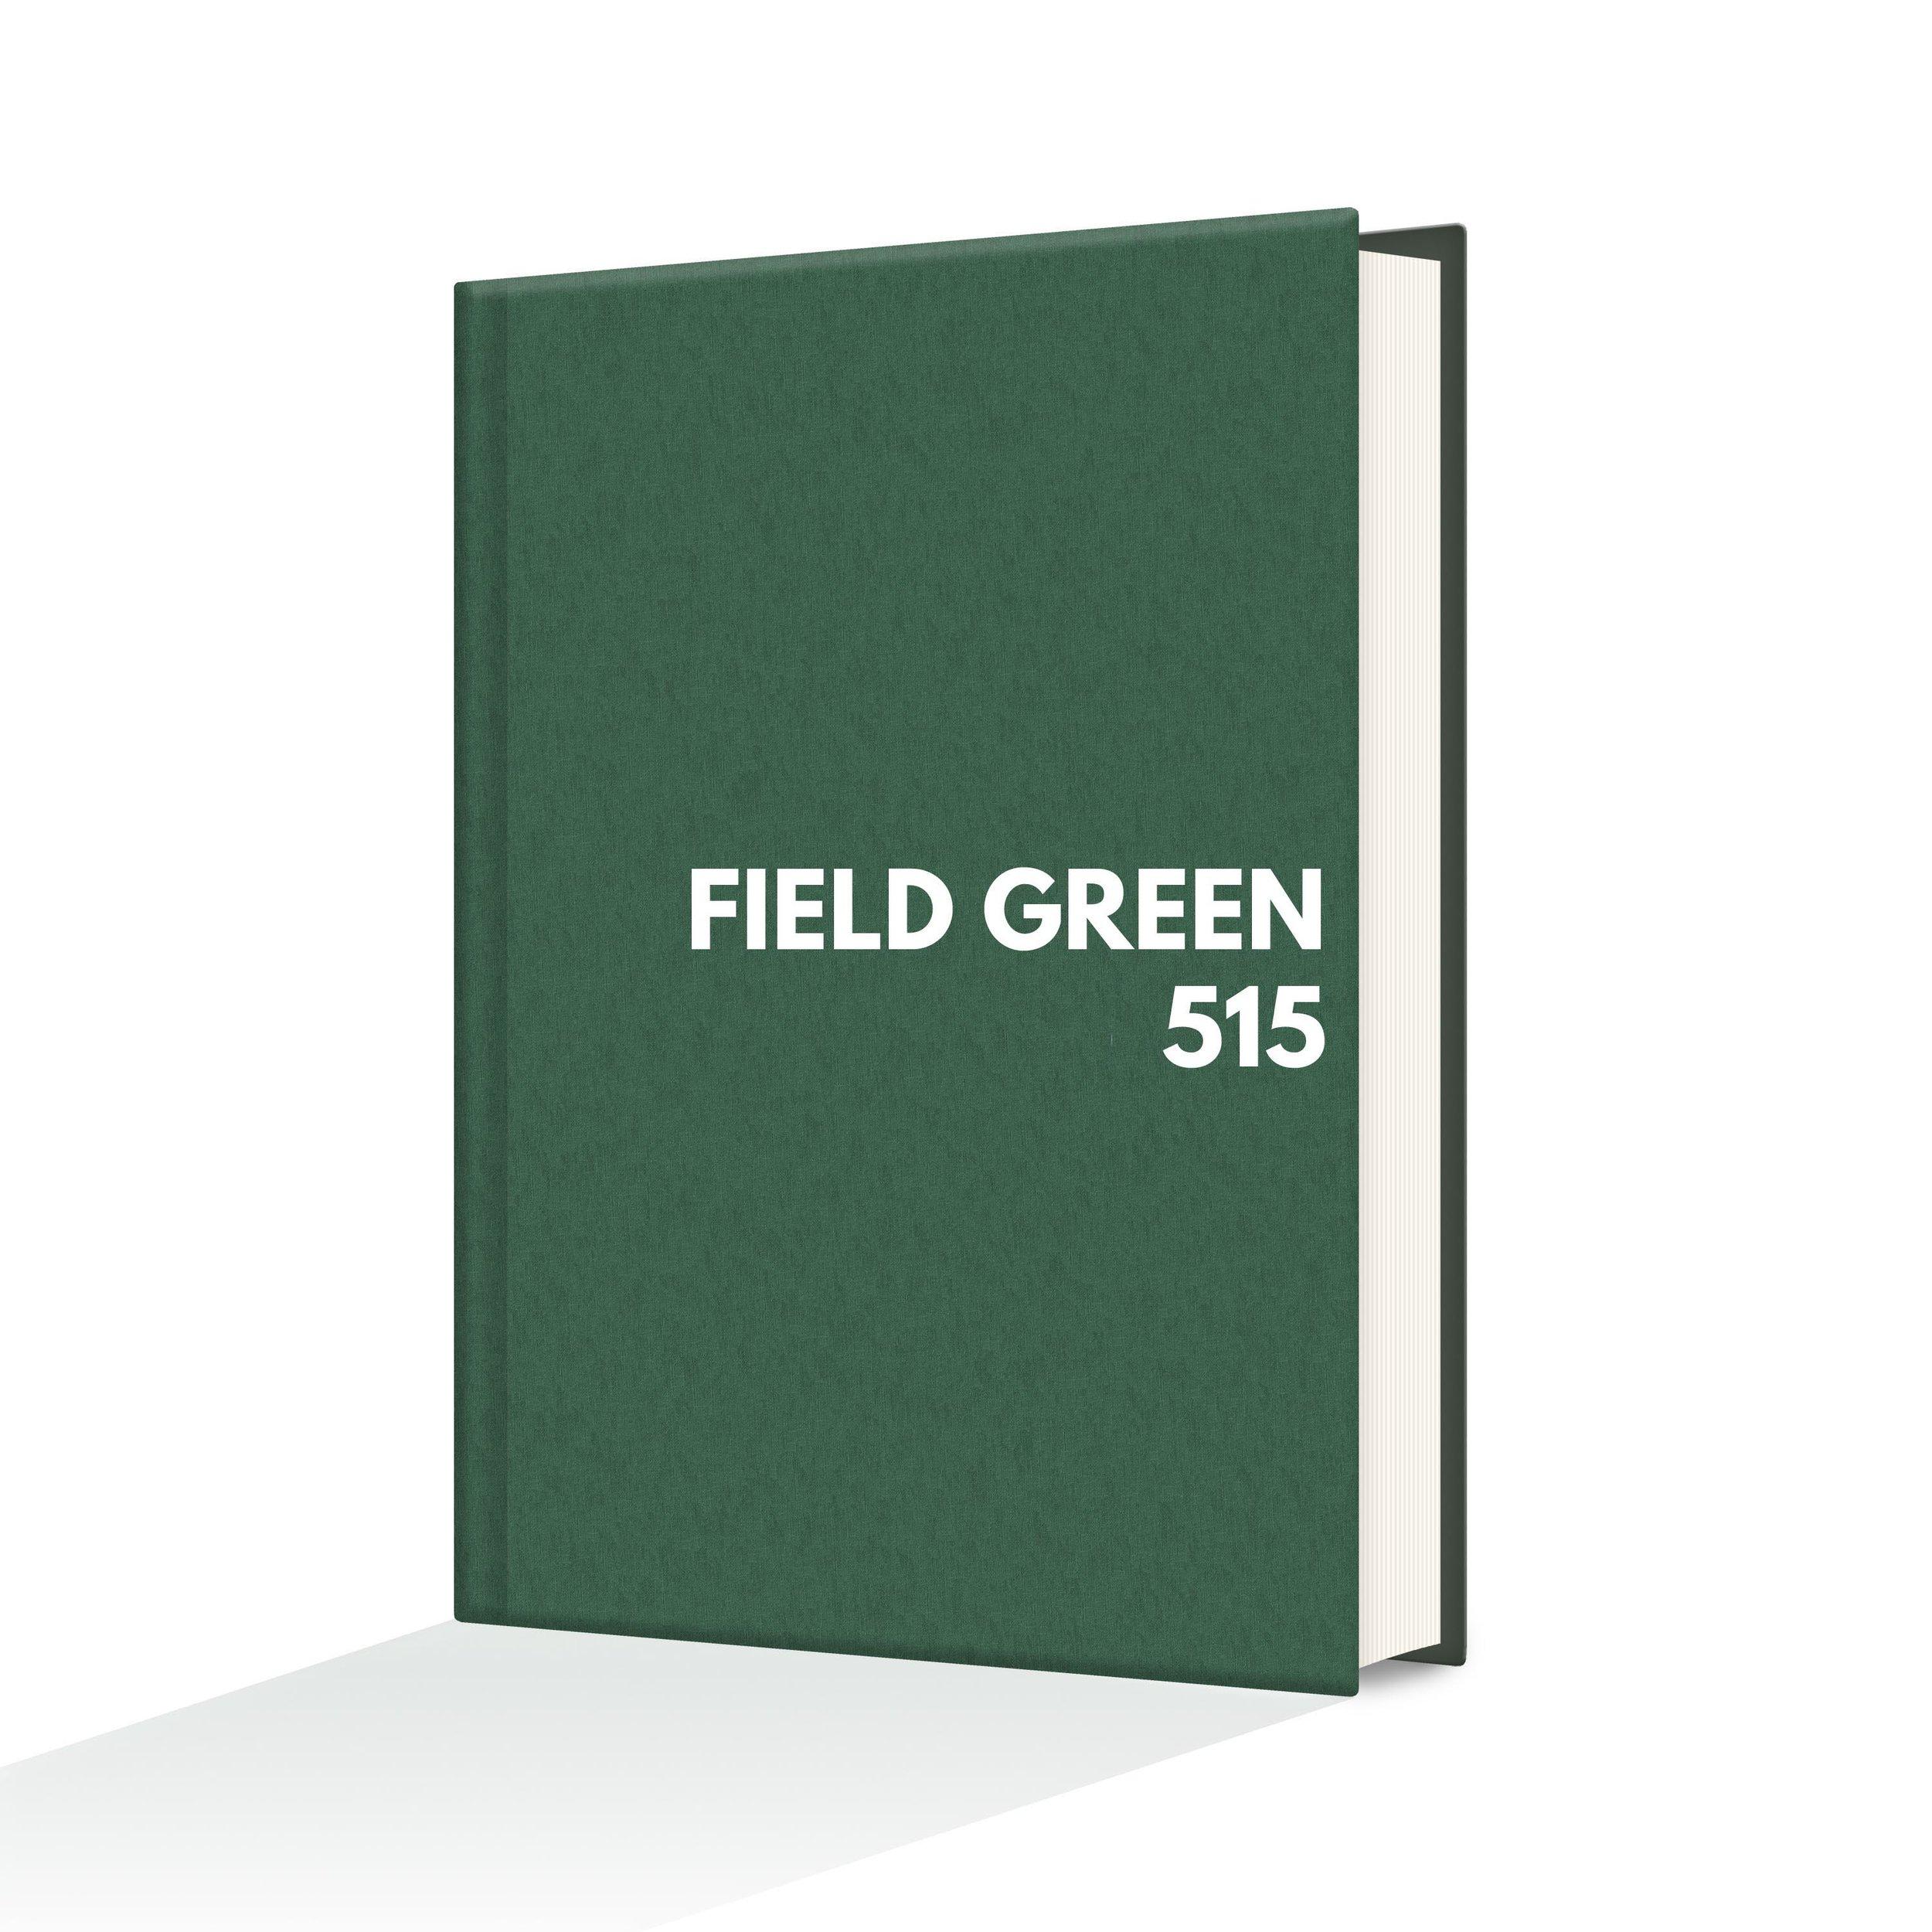 fieldgreenl515.jpg